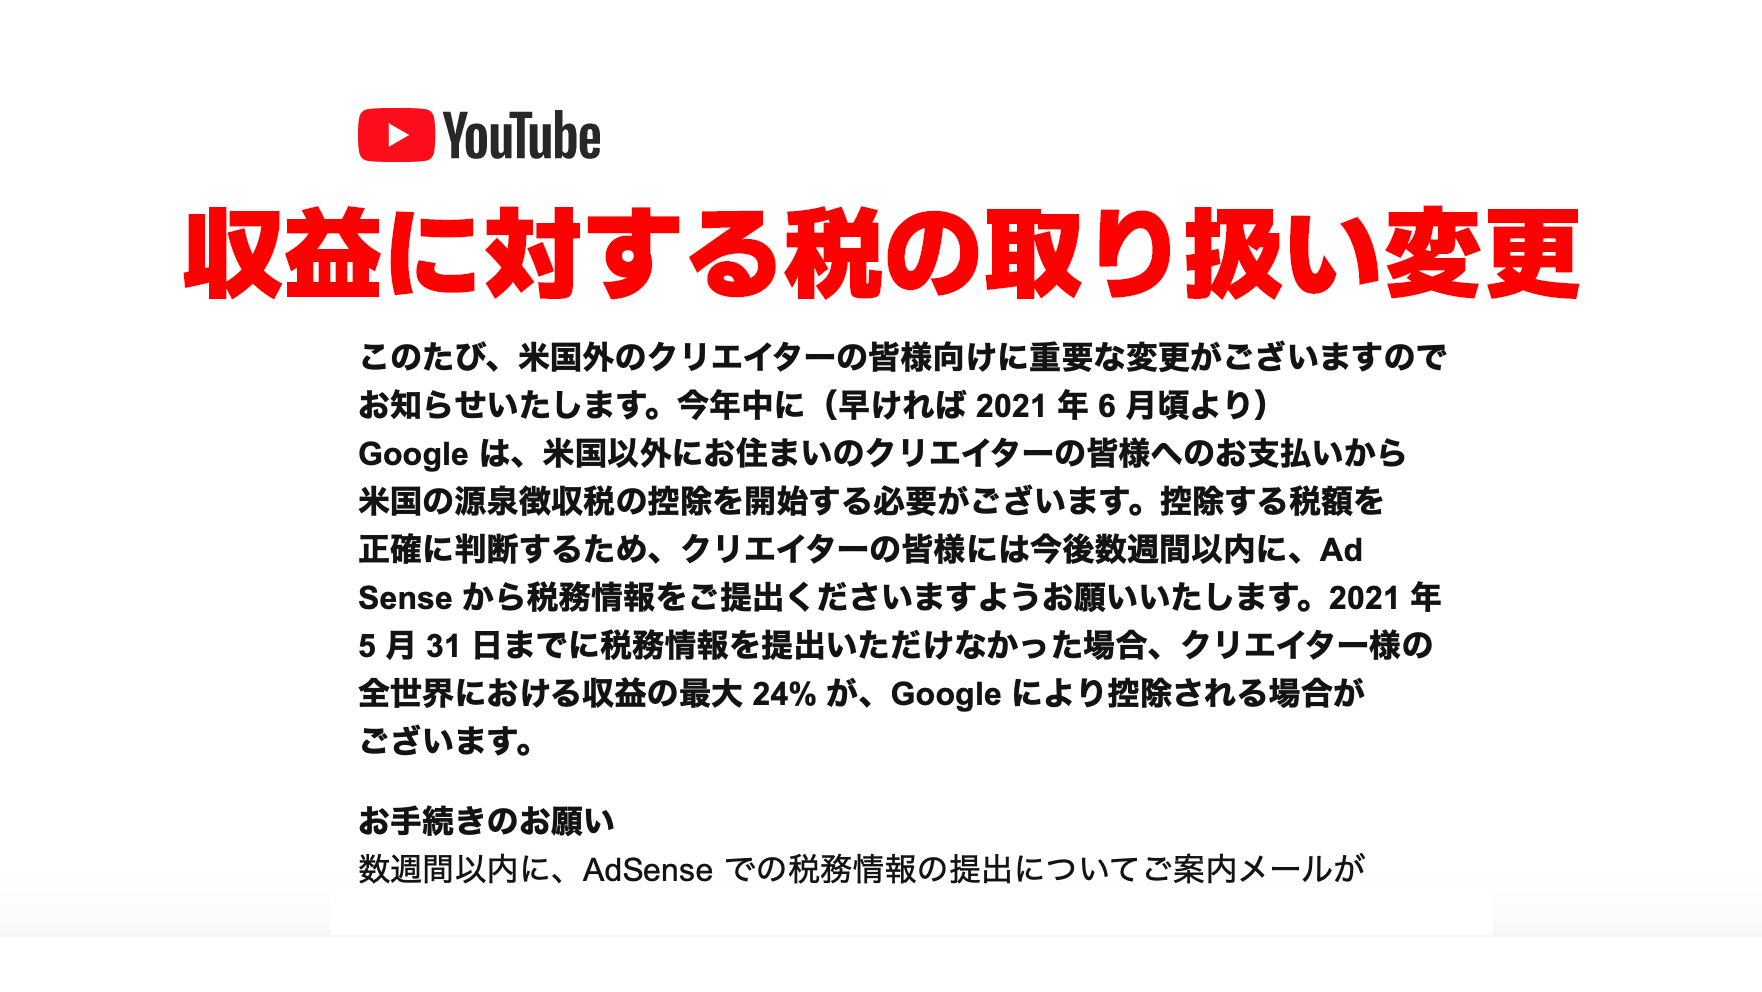 YouTube収益 24%ダウンさせないAdsense税務情報提出方法